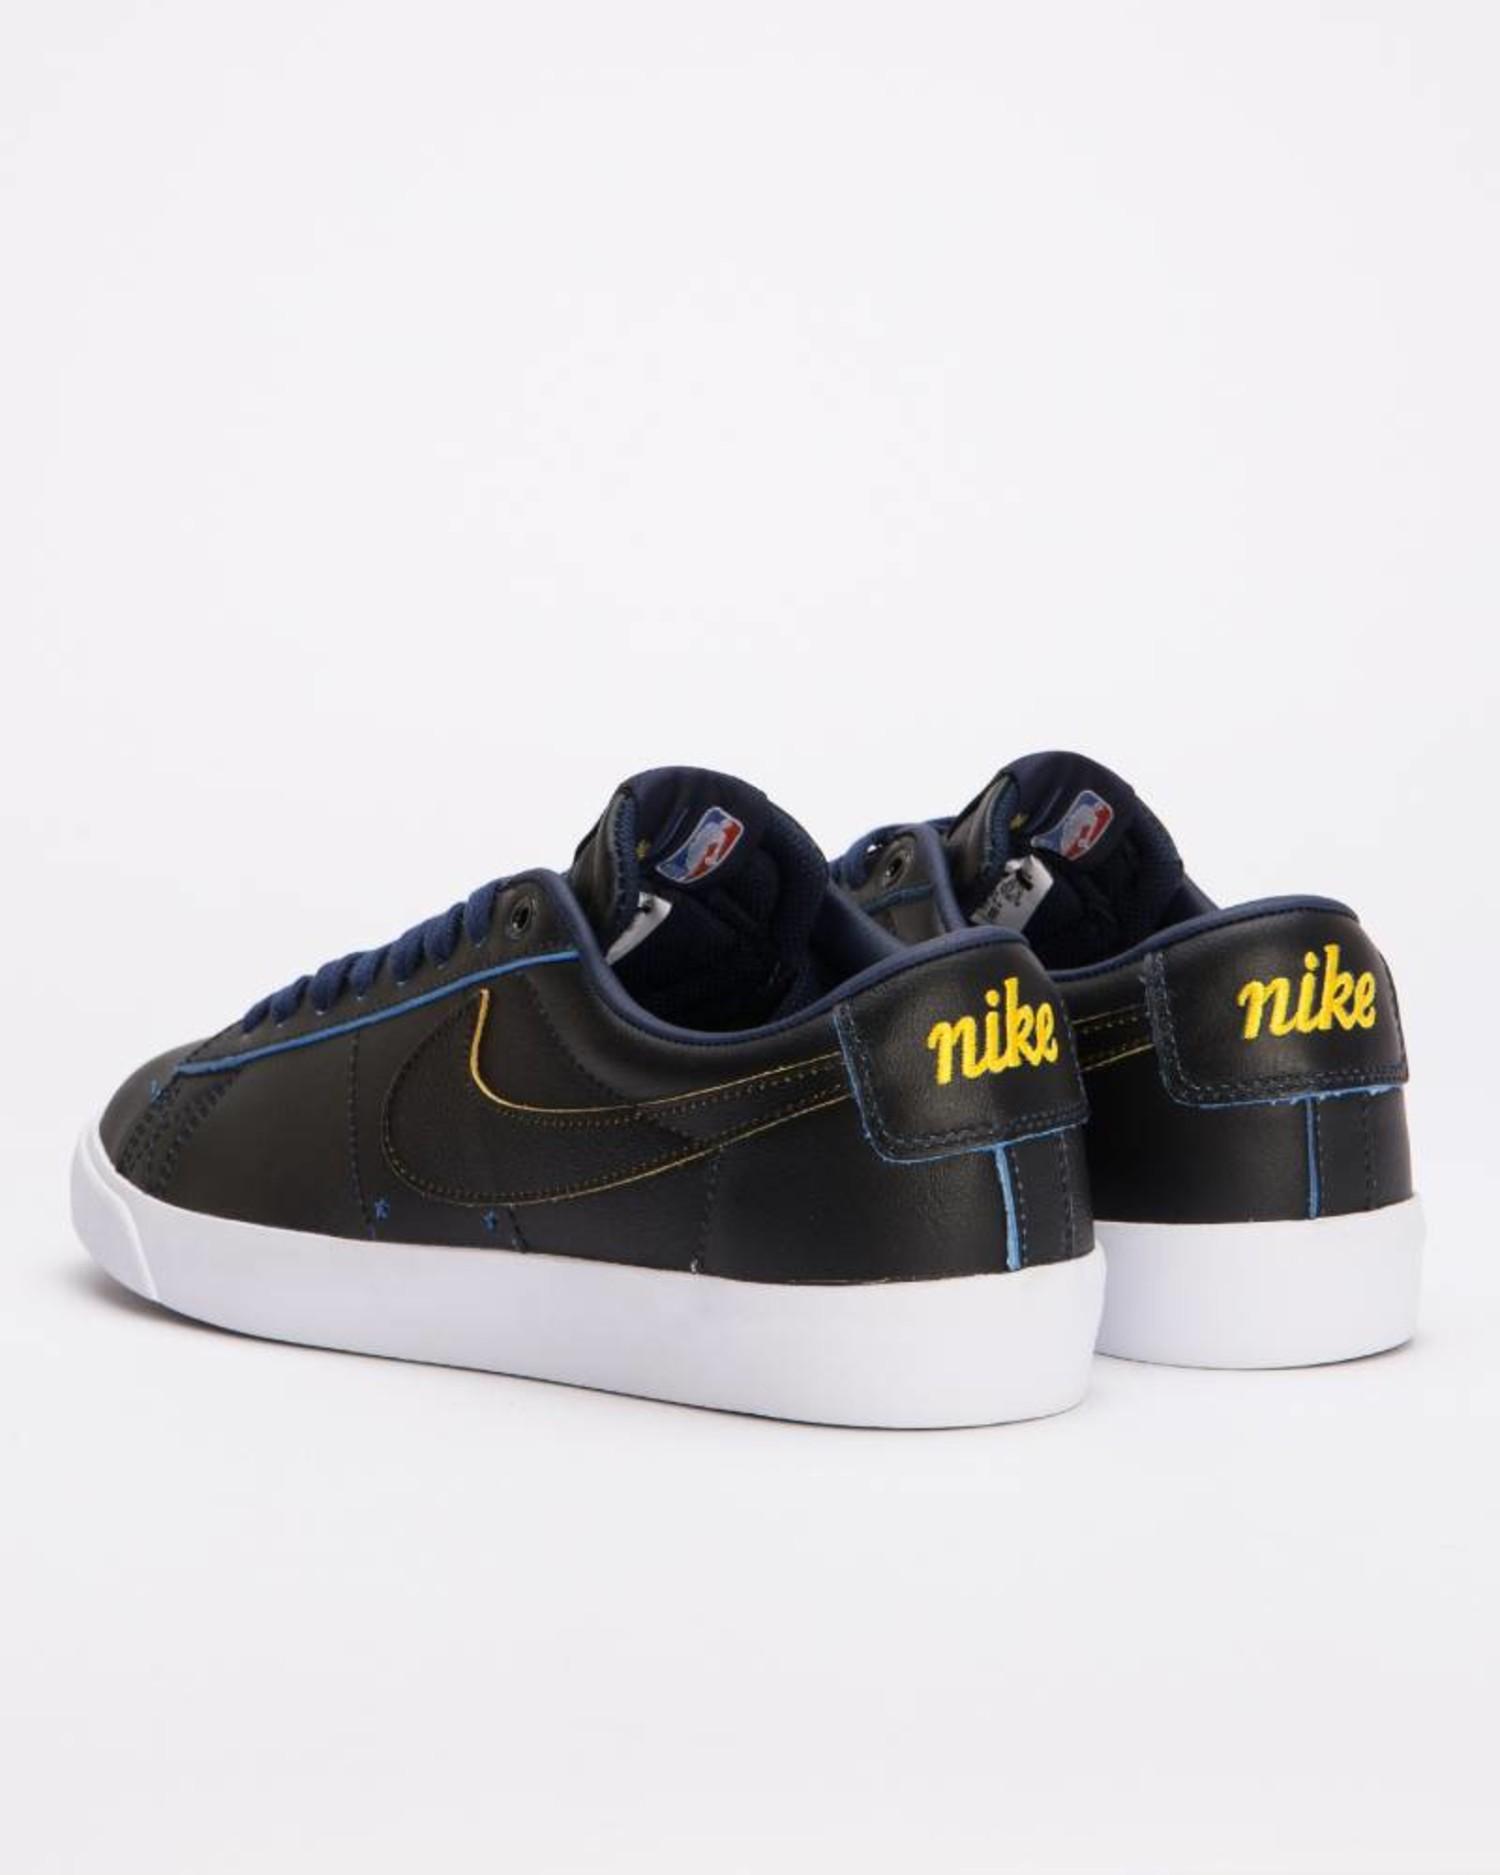 Nike SB Zoom Blazer Low GT NBA Black/Black-Amarillo-Coast